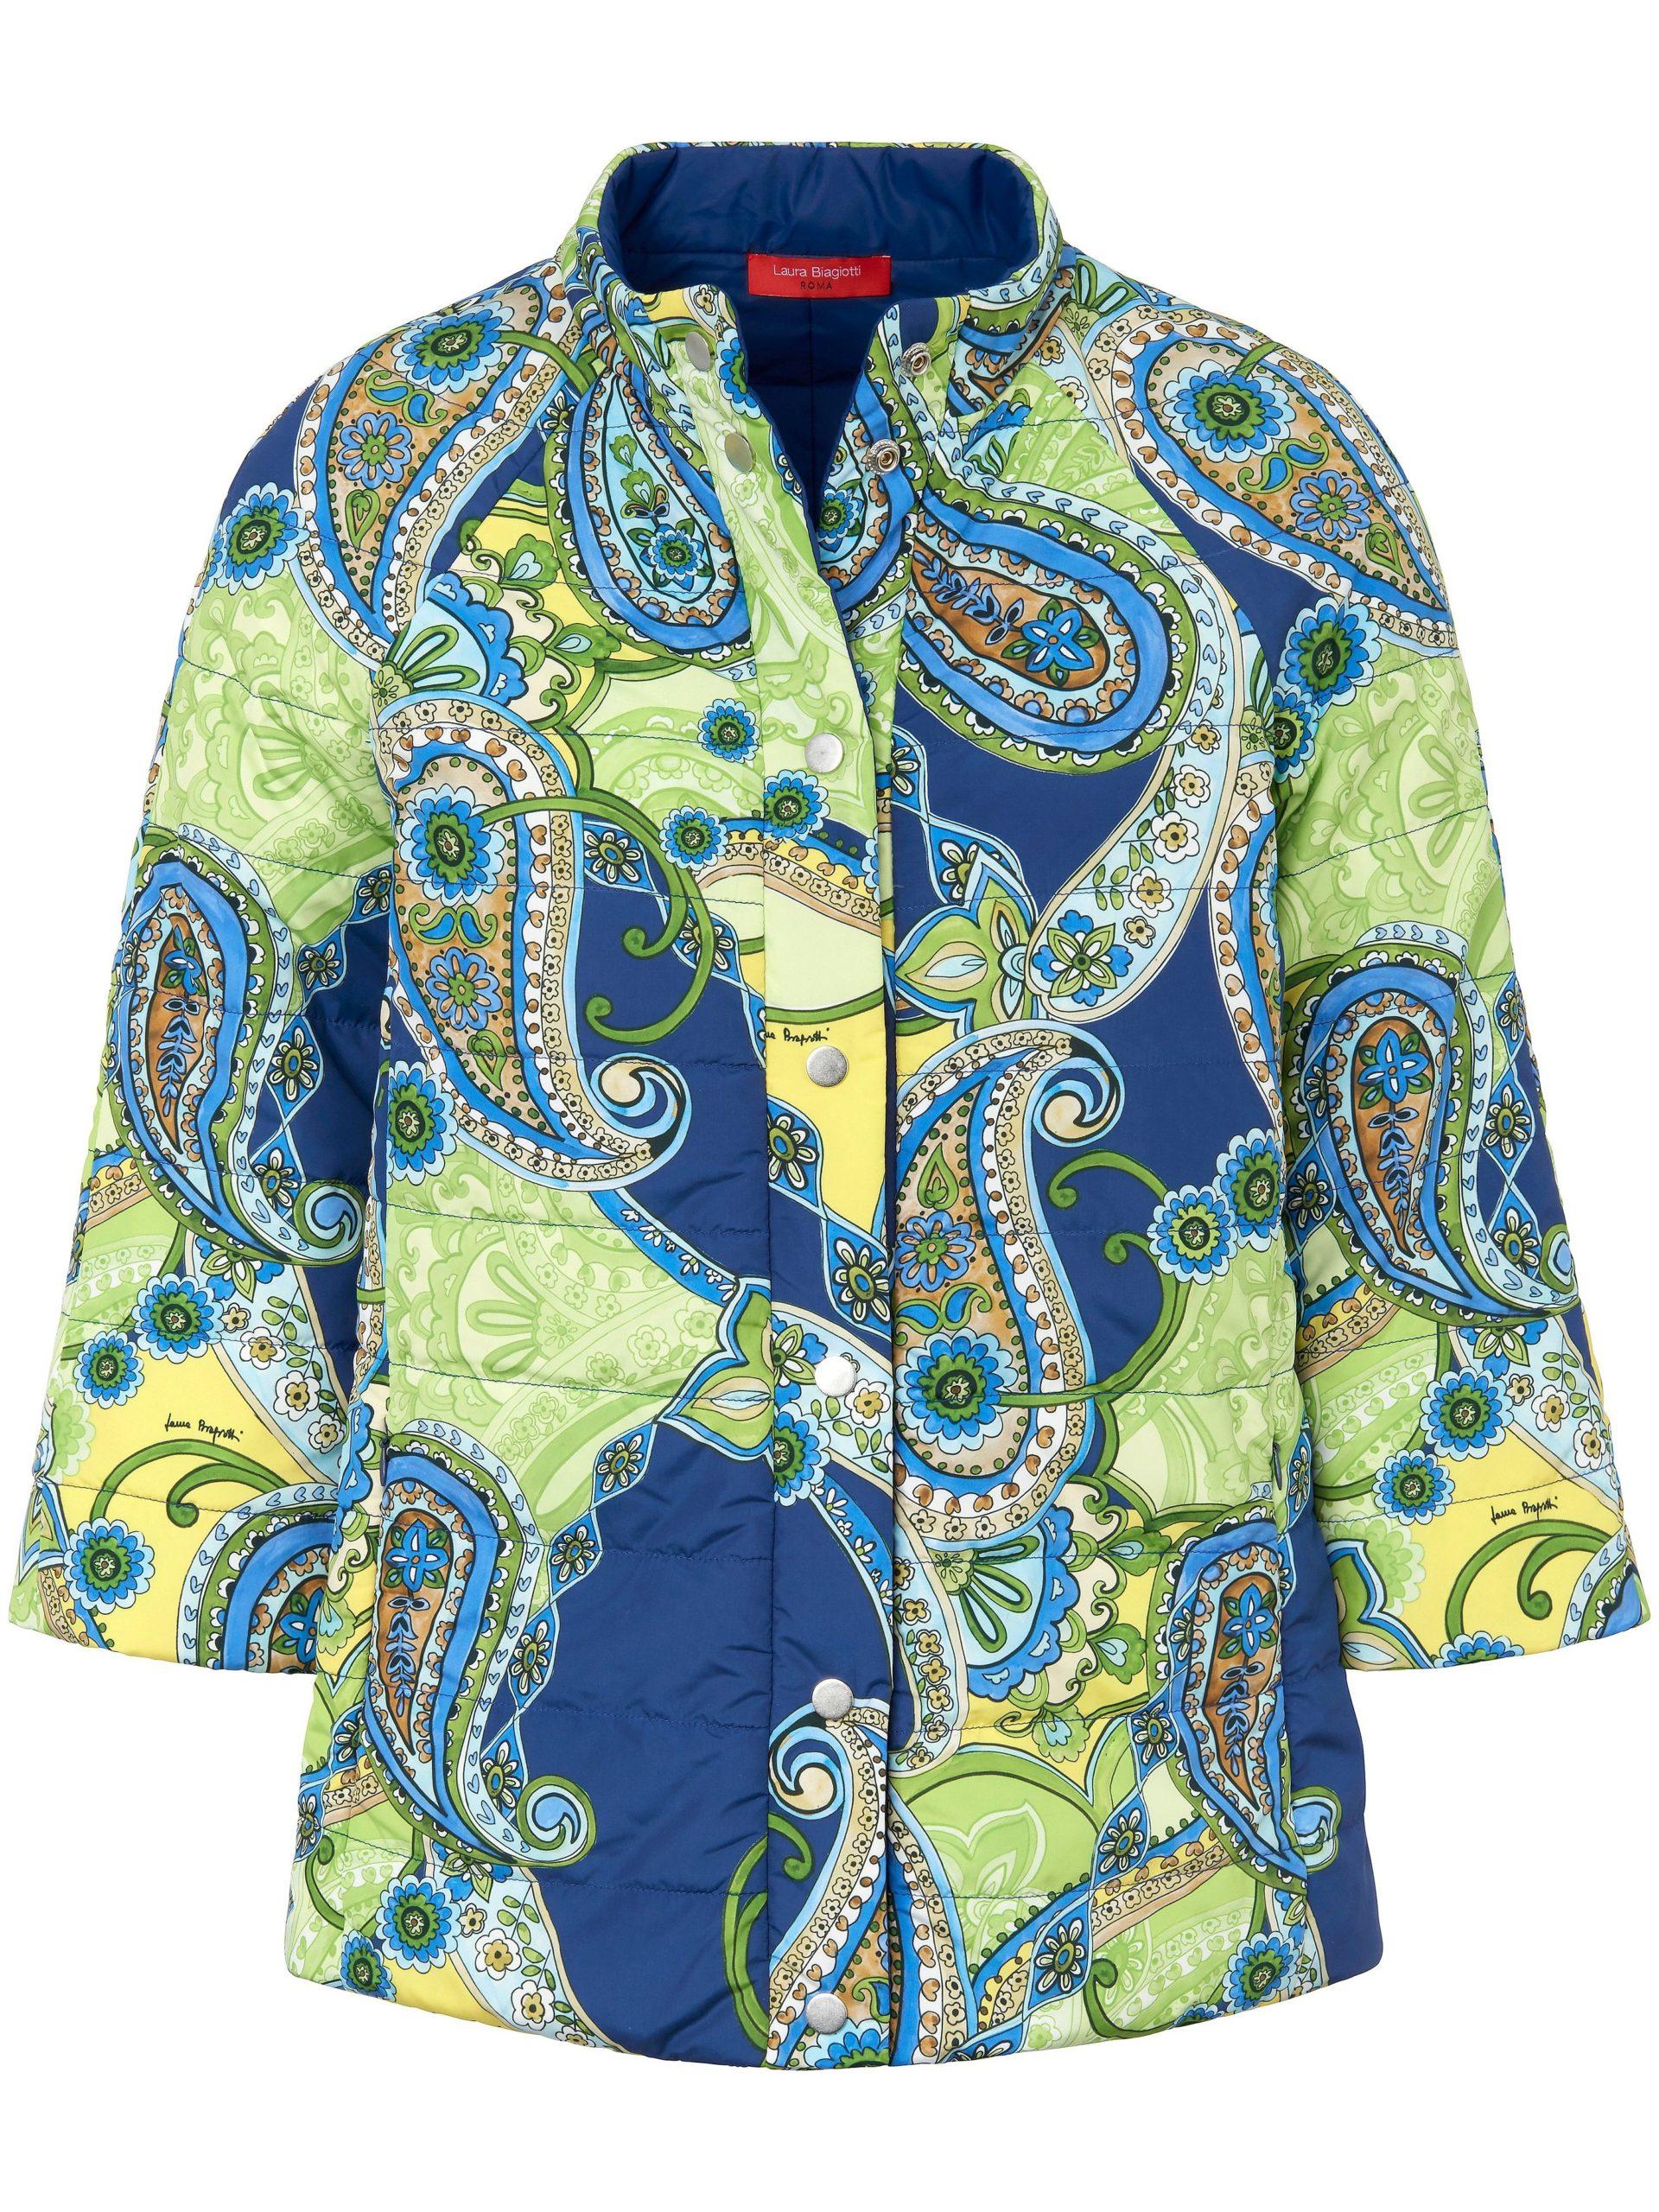 Gewatteerde jas met 7/8-mouwen Van Laura Biagiotti Roma multicolour Kopen